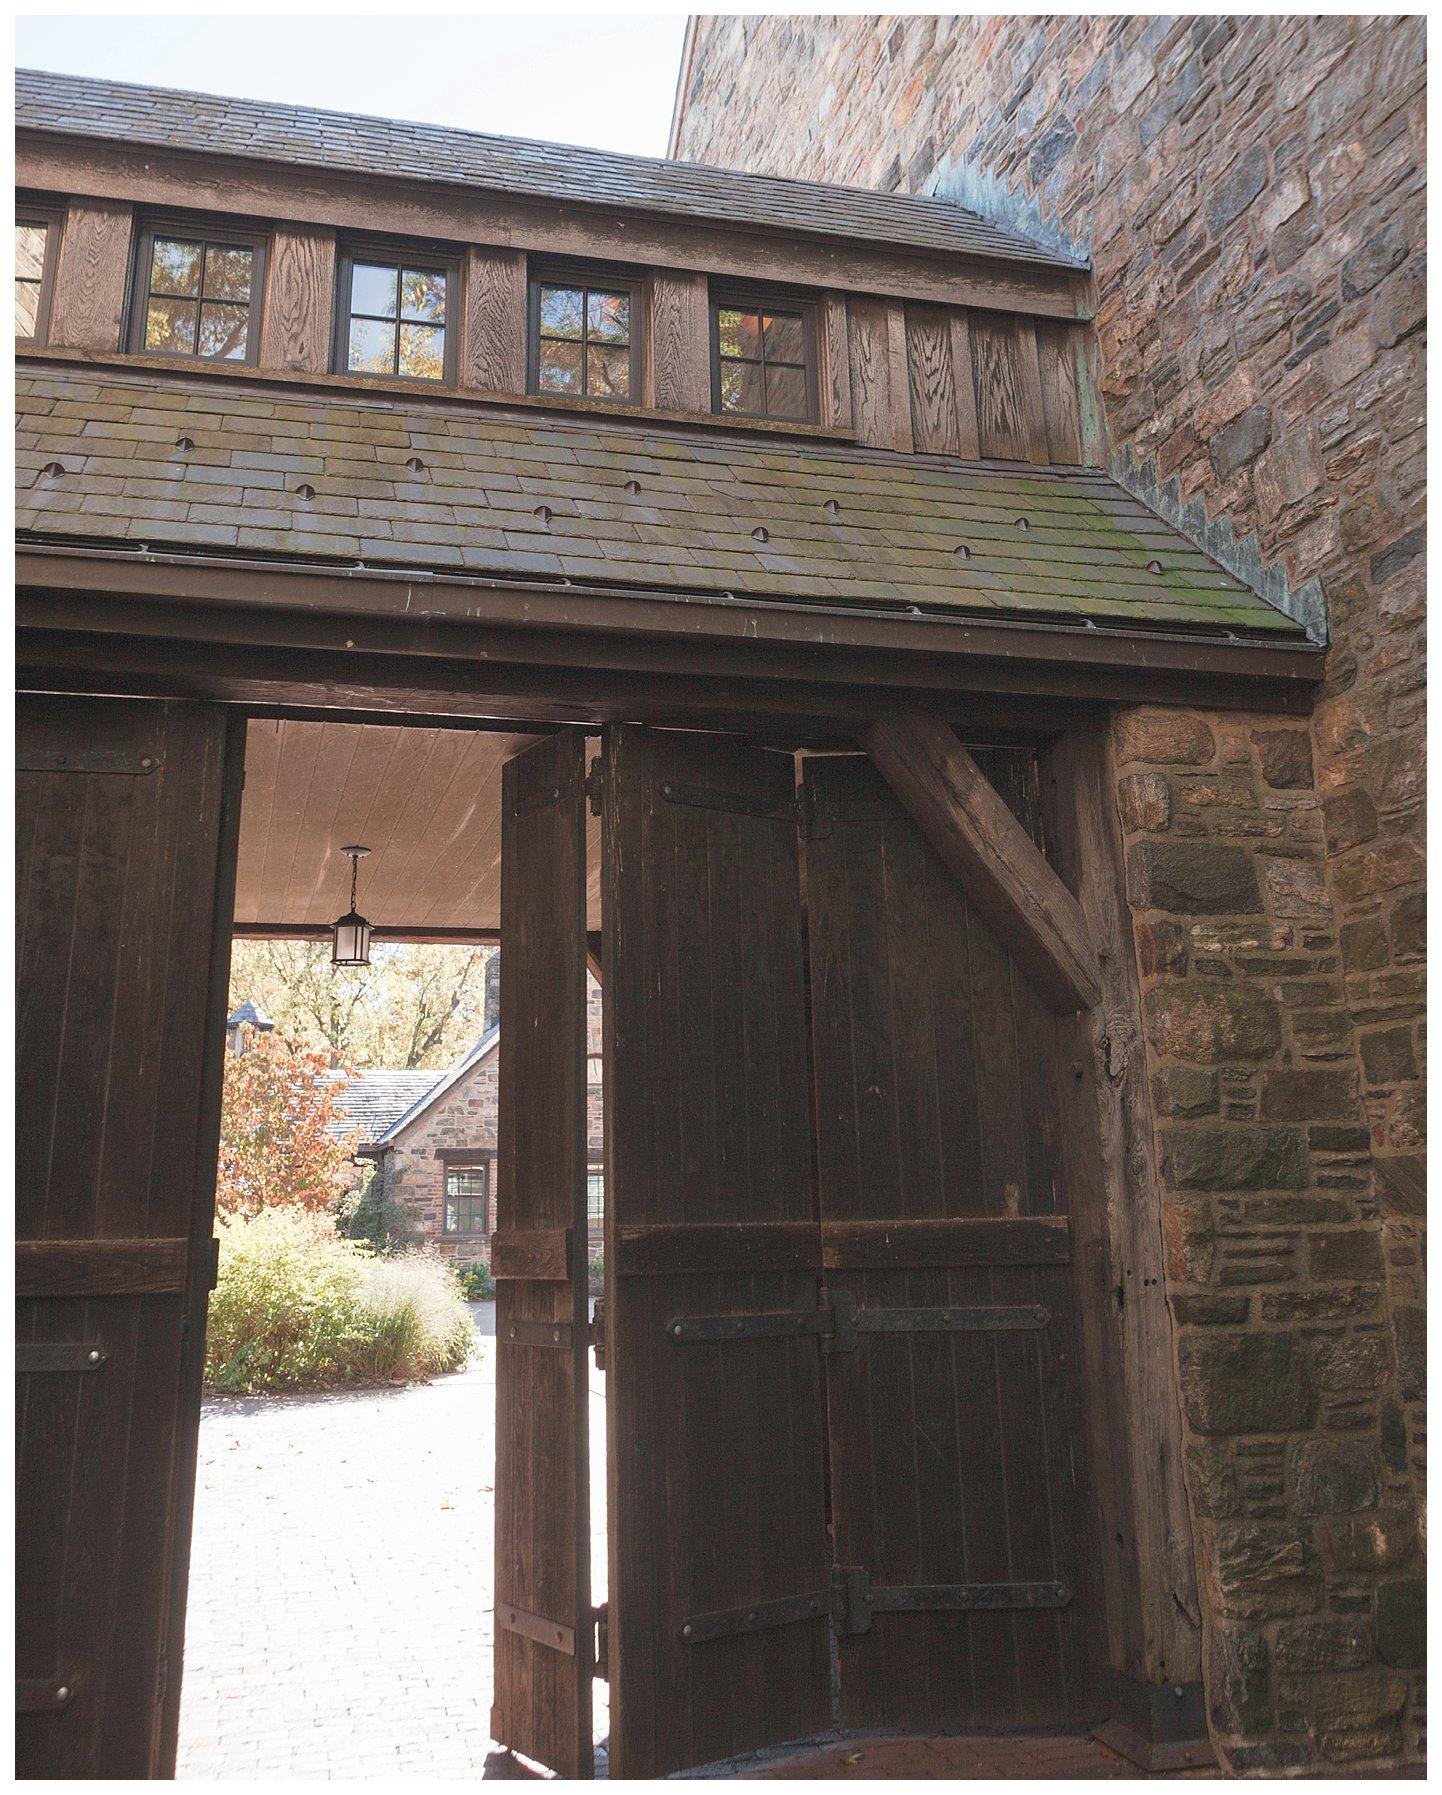 Stone Barns F18-7333.jpg